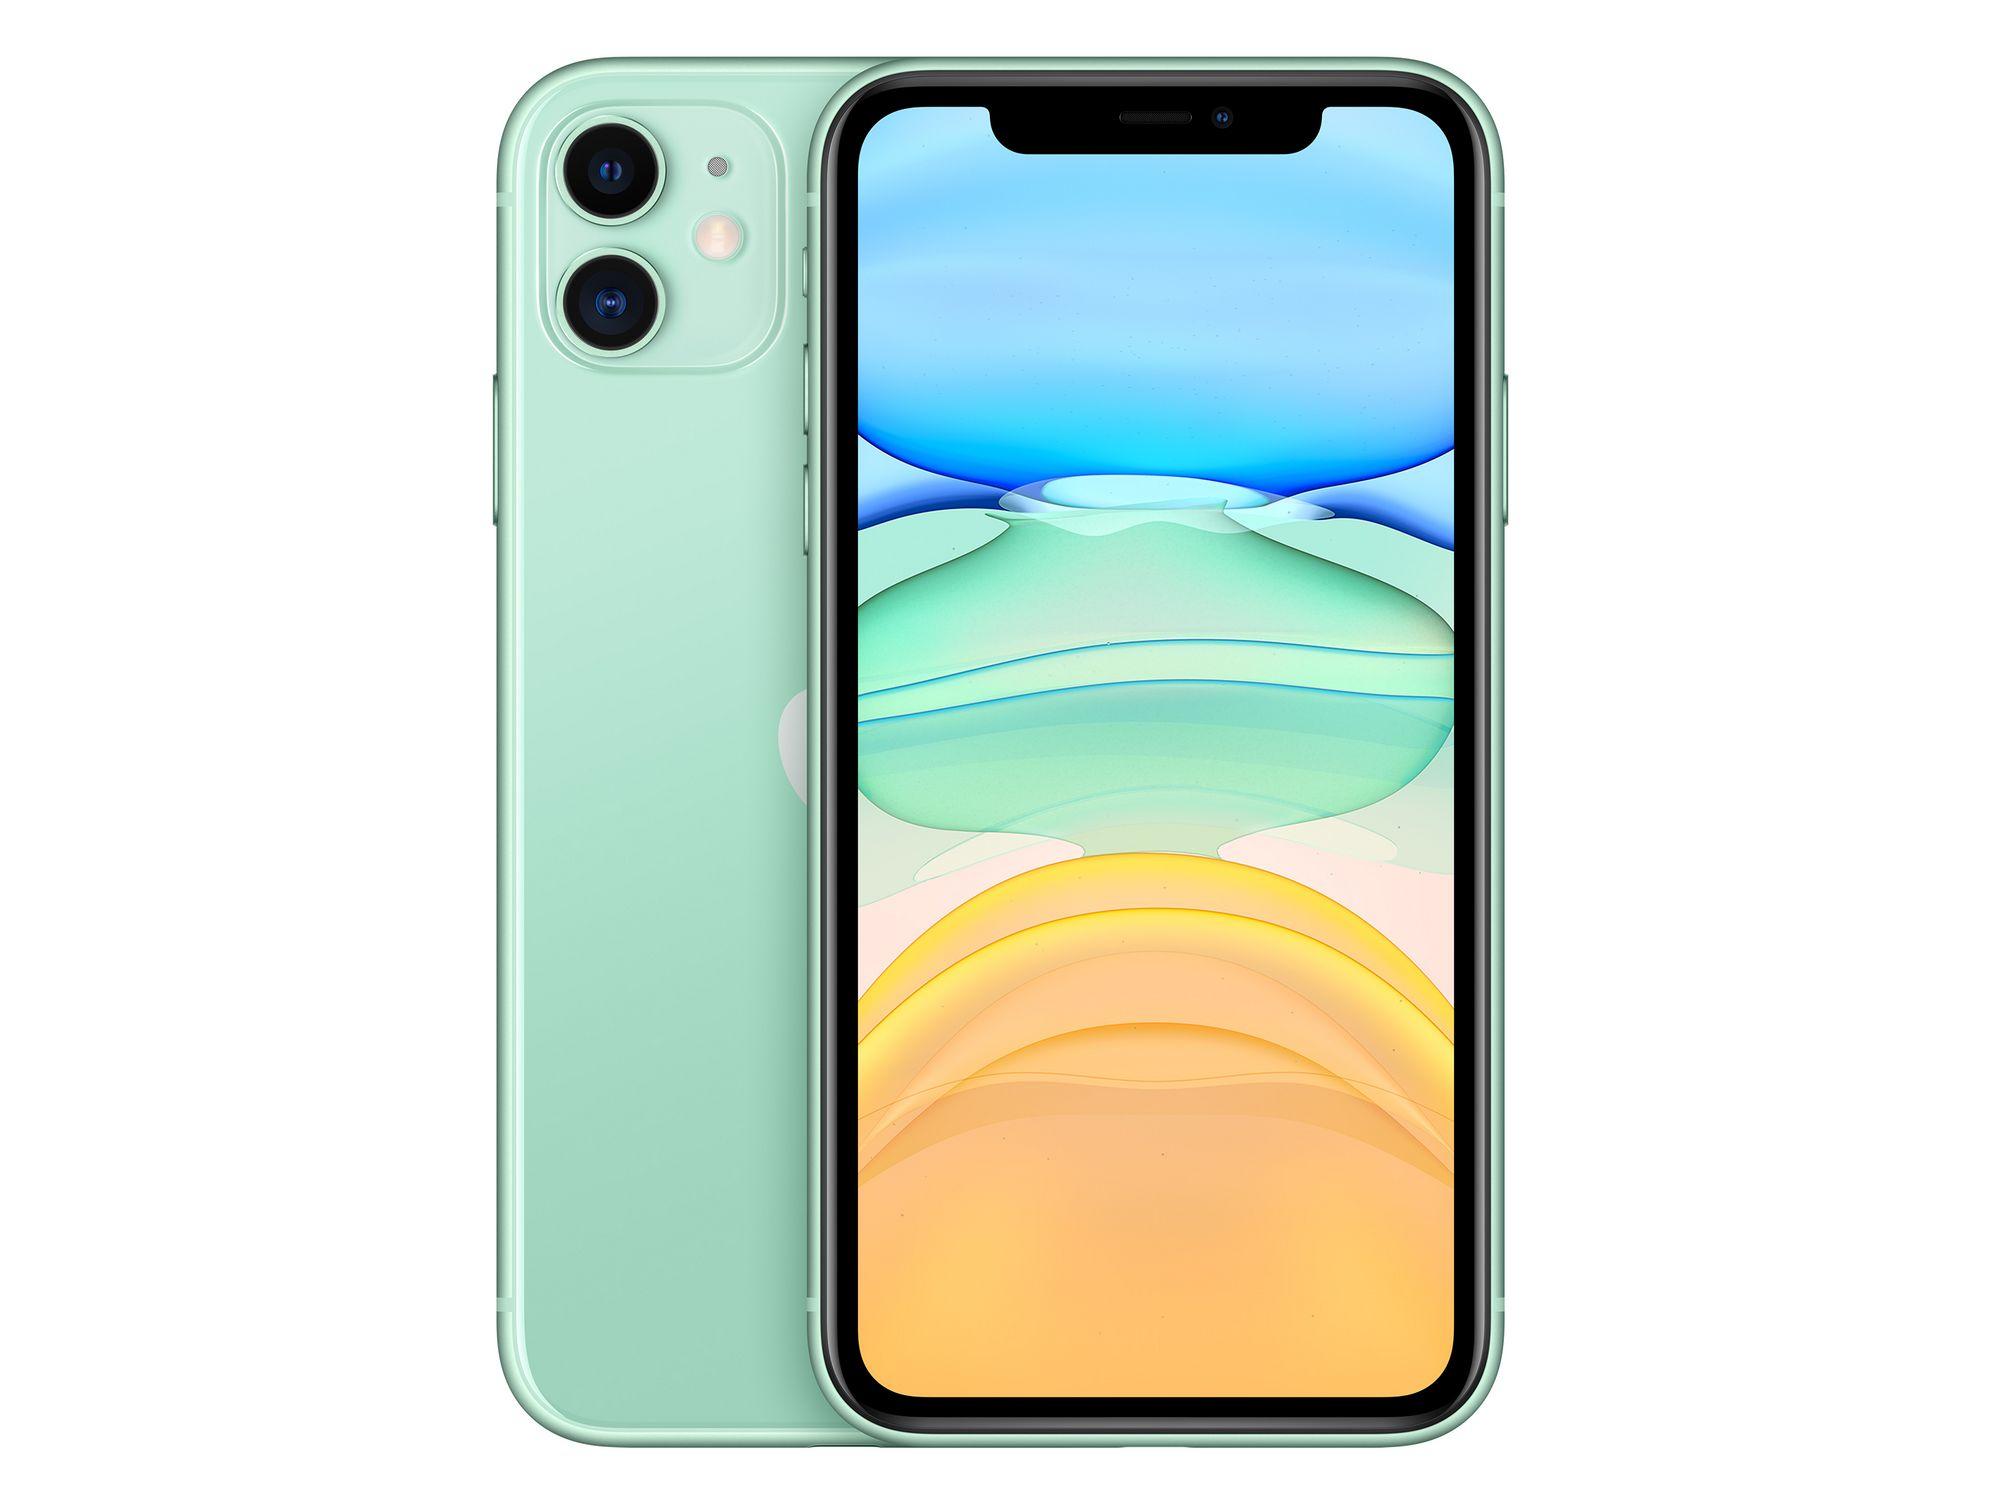 iphone 11-comparison_table-m-1